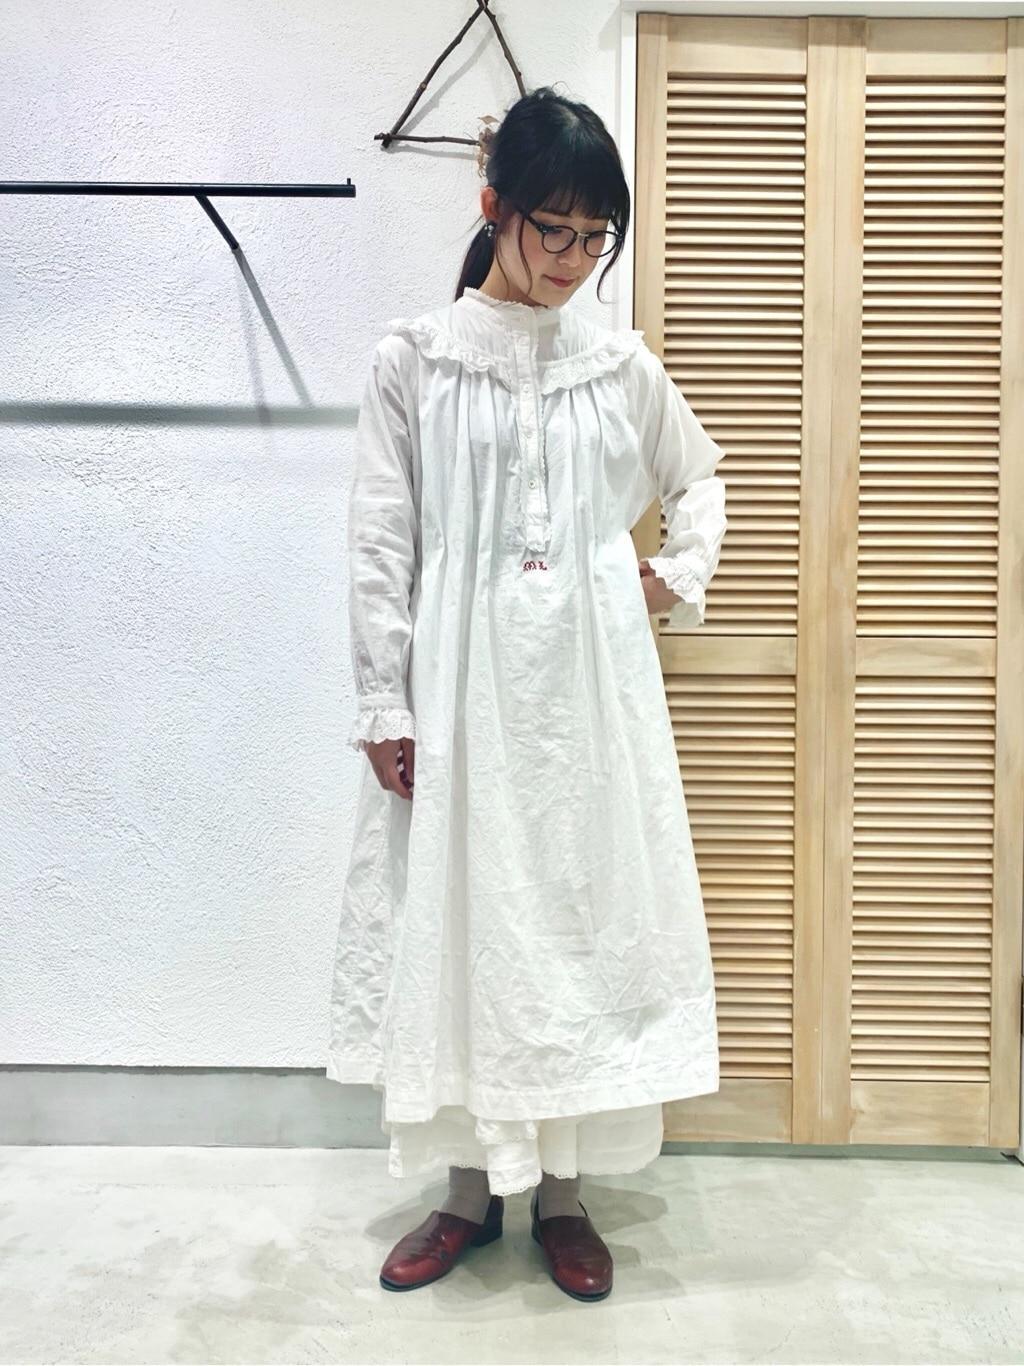 chambre de charme 横浜ジョイナス 身長:162cm 2021.02.22